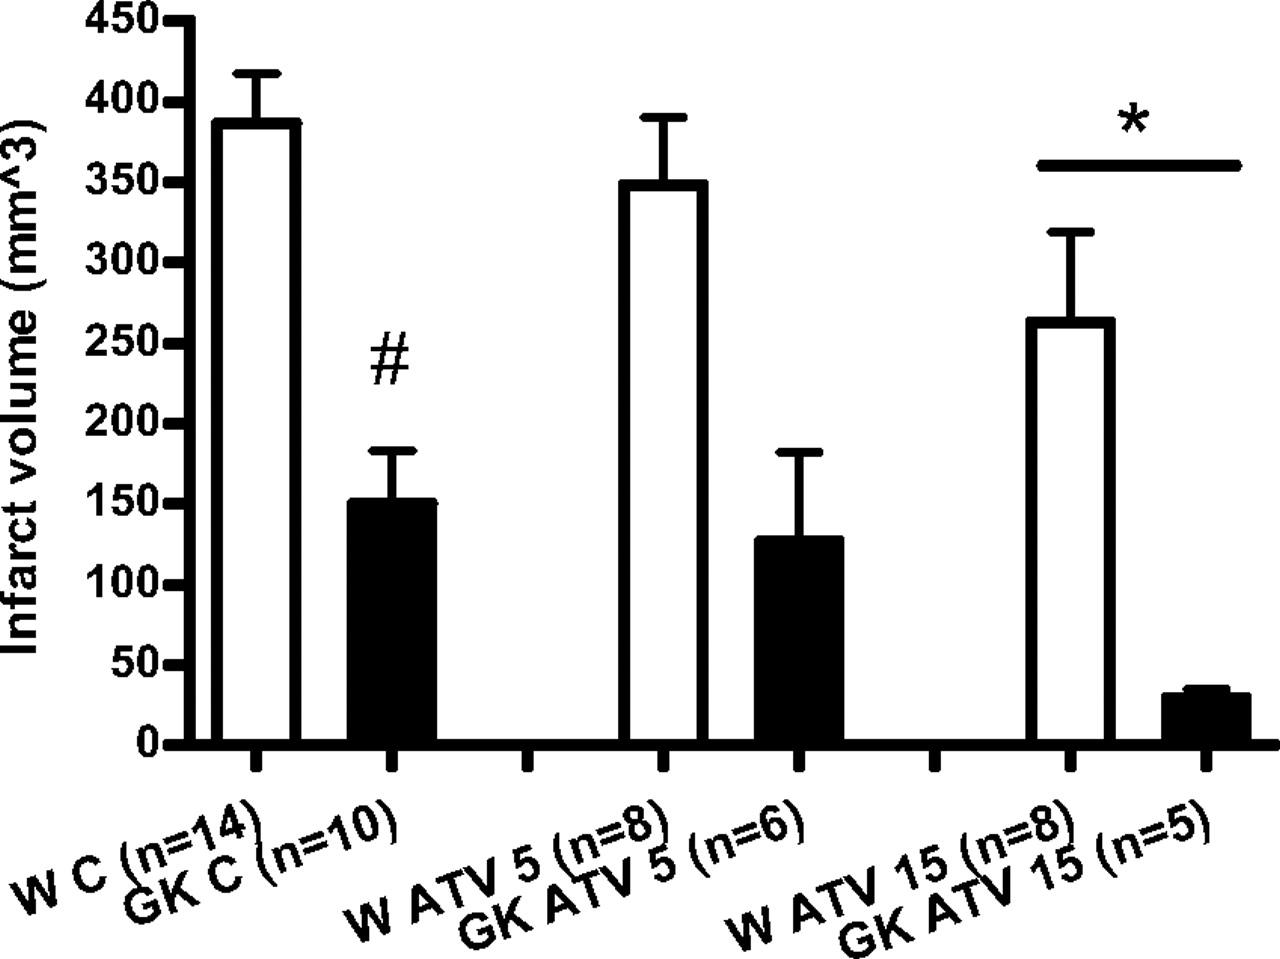 Bmc 150 Atv Wiring Diagram Detailed Diagrams Baja 50 Early Atorvastatin Reduces Hemorrhage After Acute Cerebral Ischemia 50cc